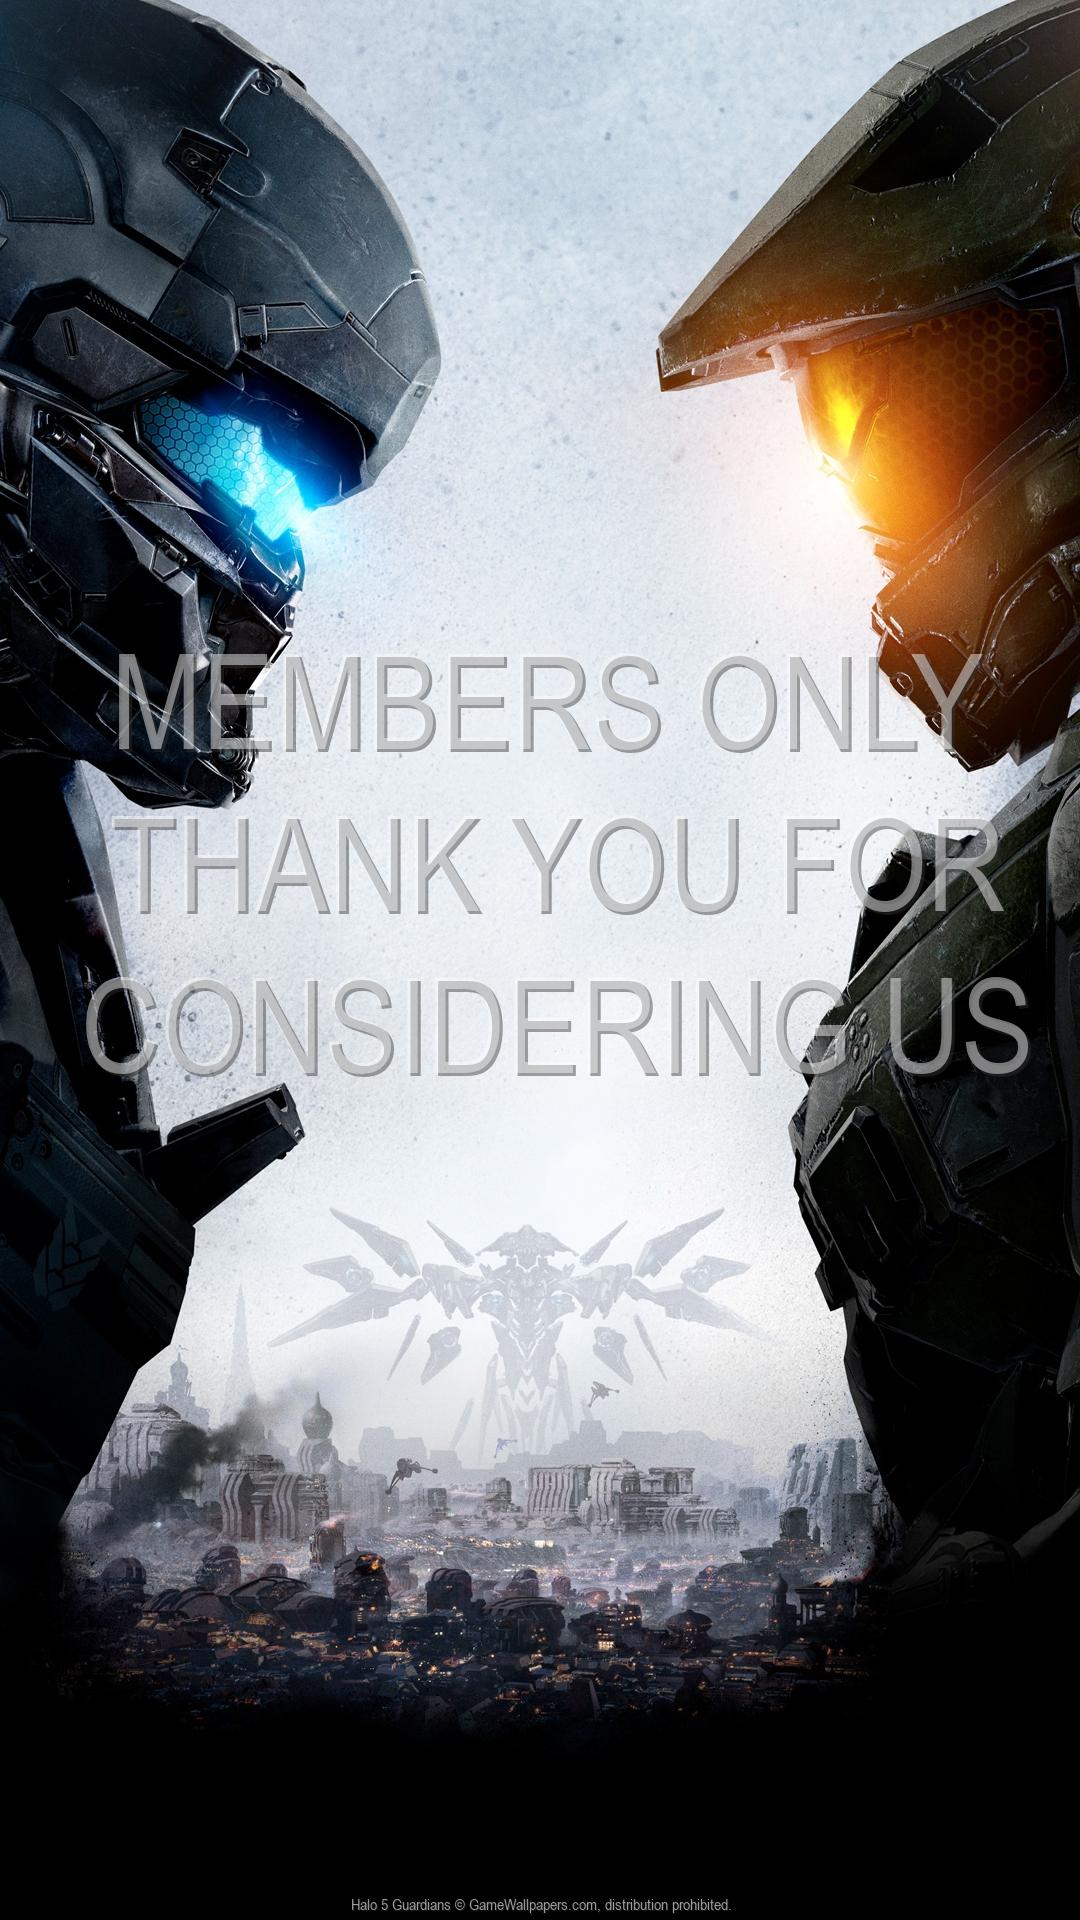 Halo 5: Guardians 1920x1080 Handy Hintergrundbild 01